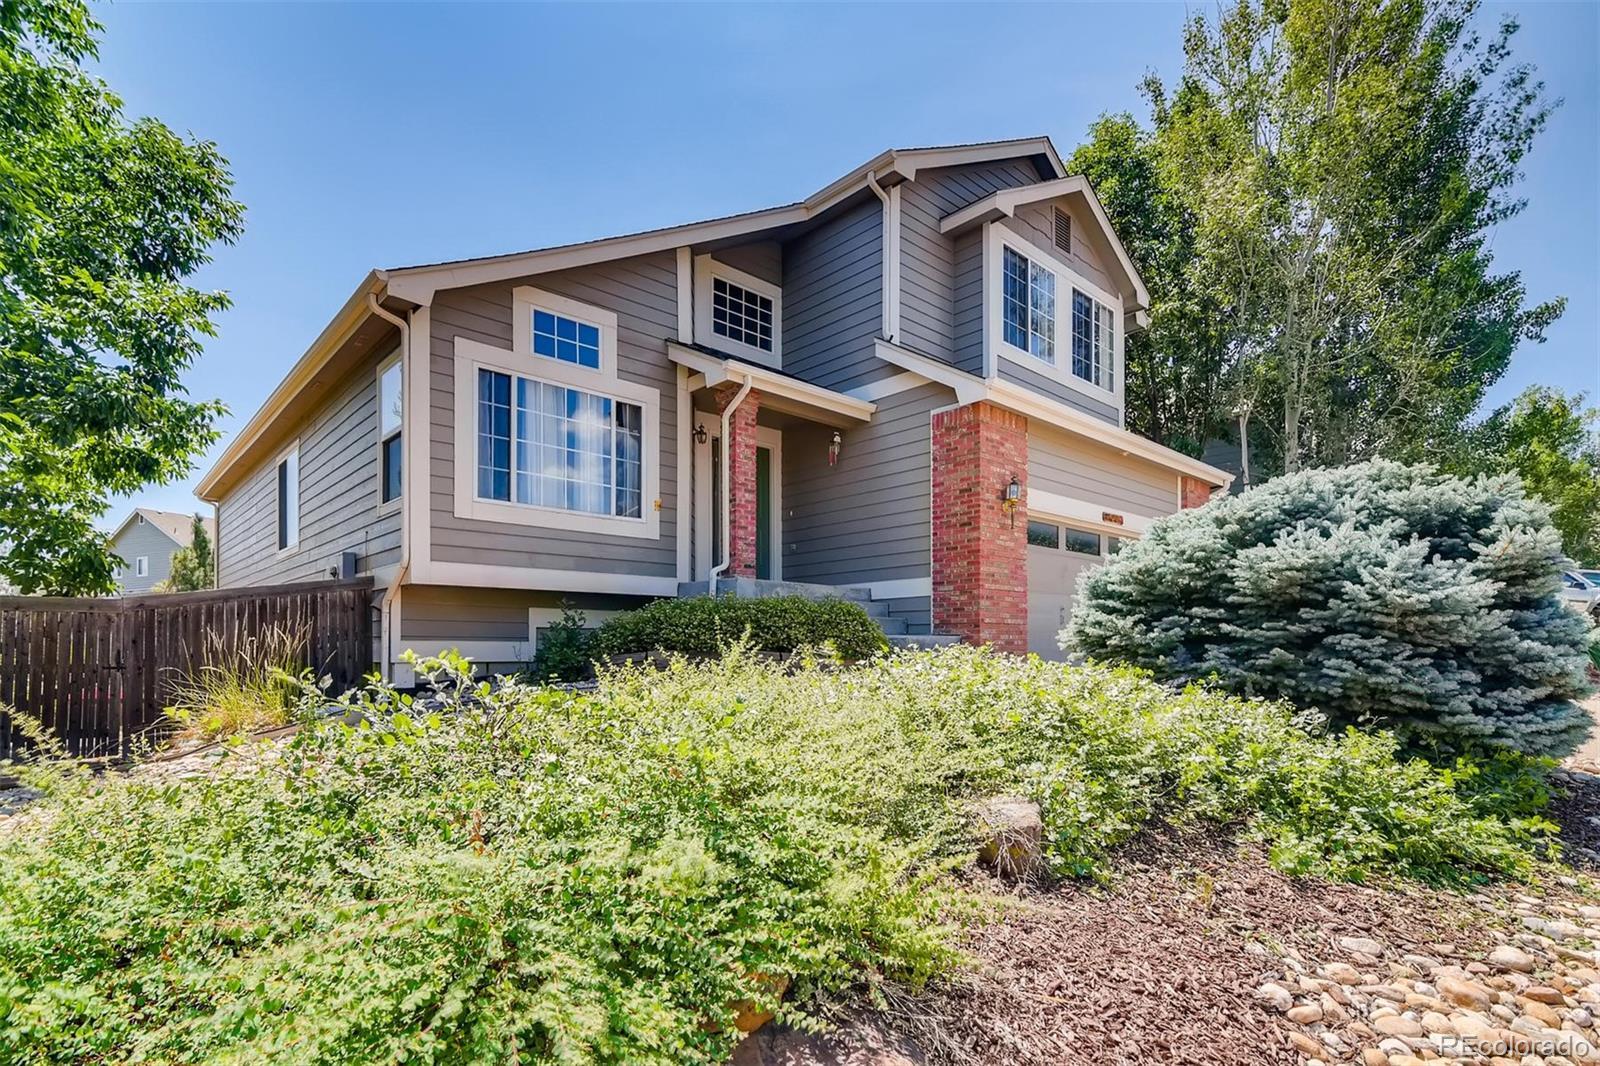 MLS# 9724731 - 3 - 498 Promontory Drive, Loveland, CO 80537